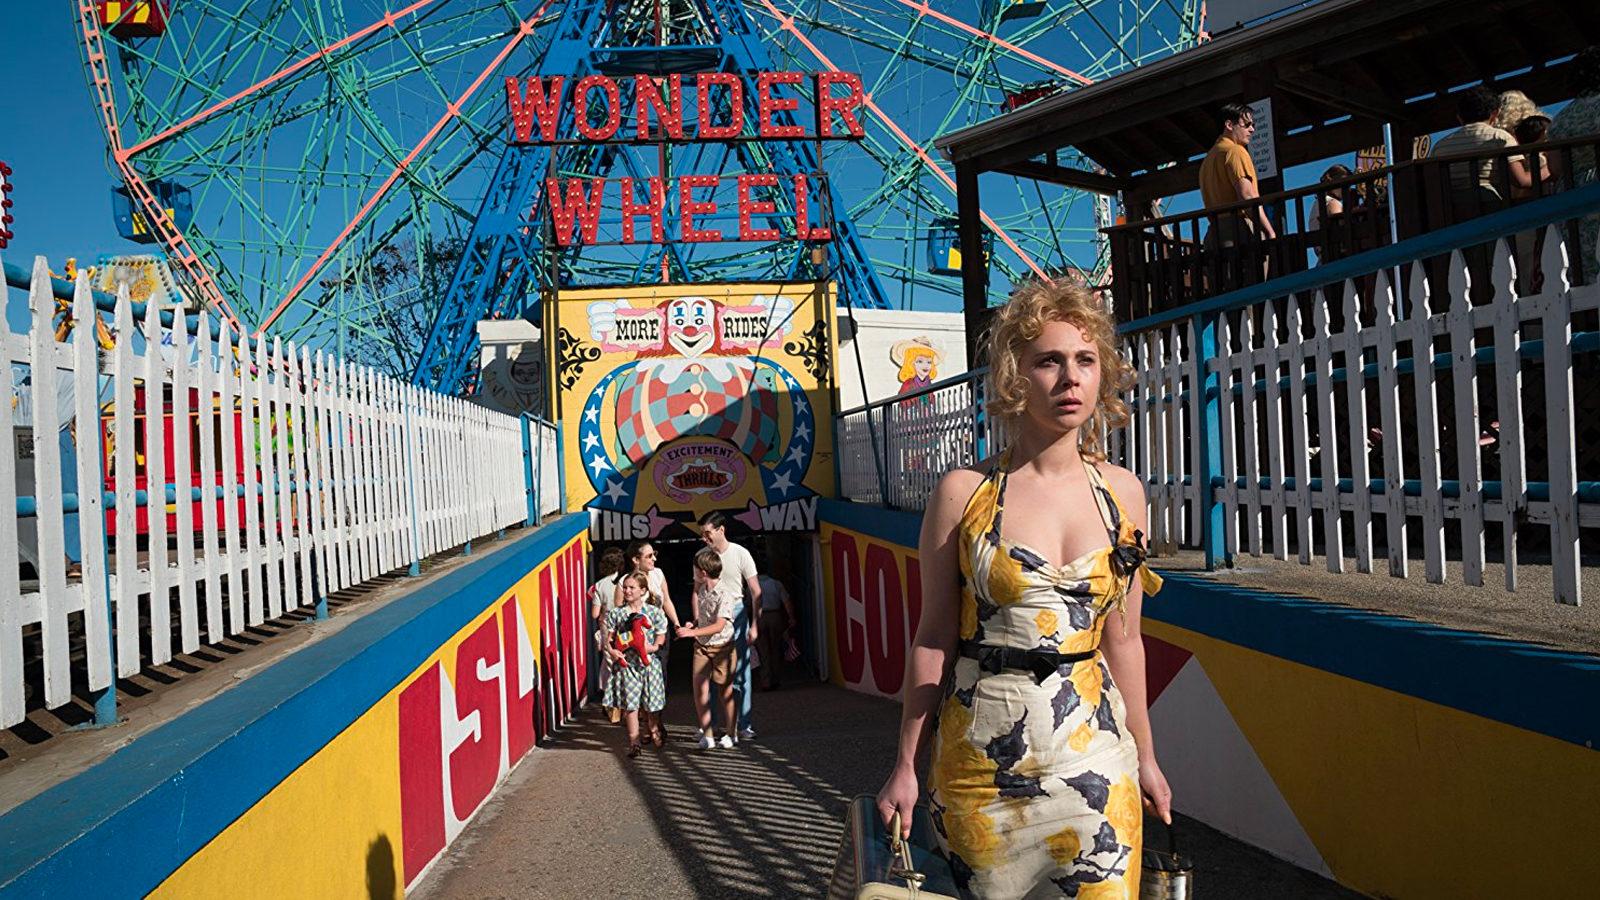 wonder_wheel_2.jpg